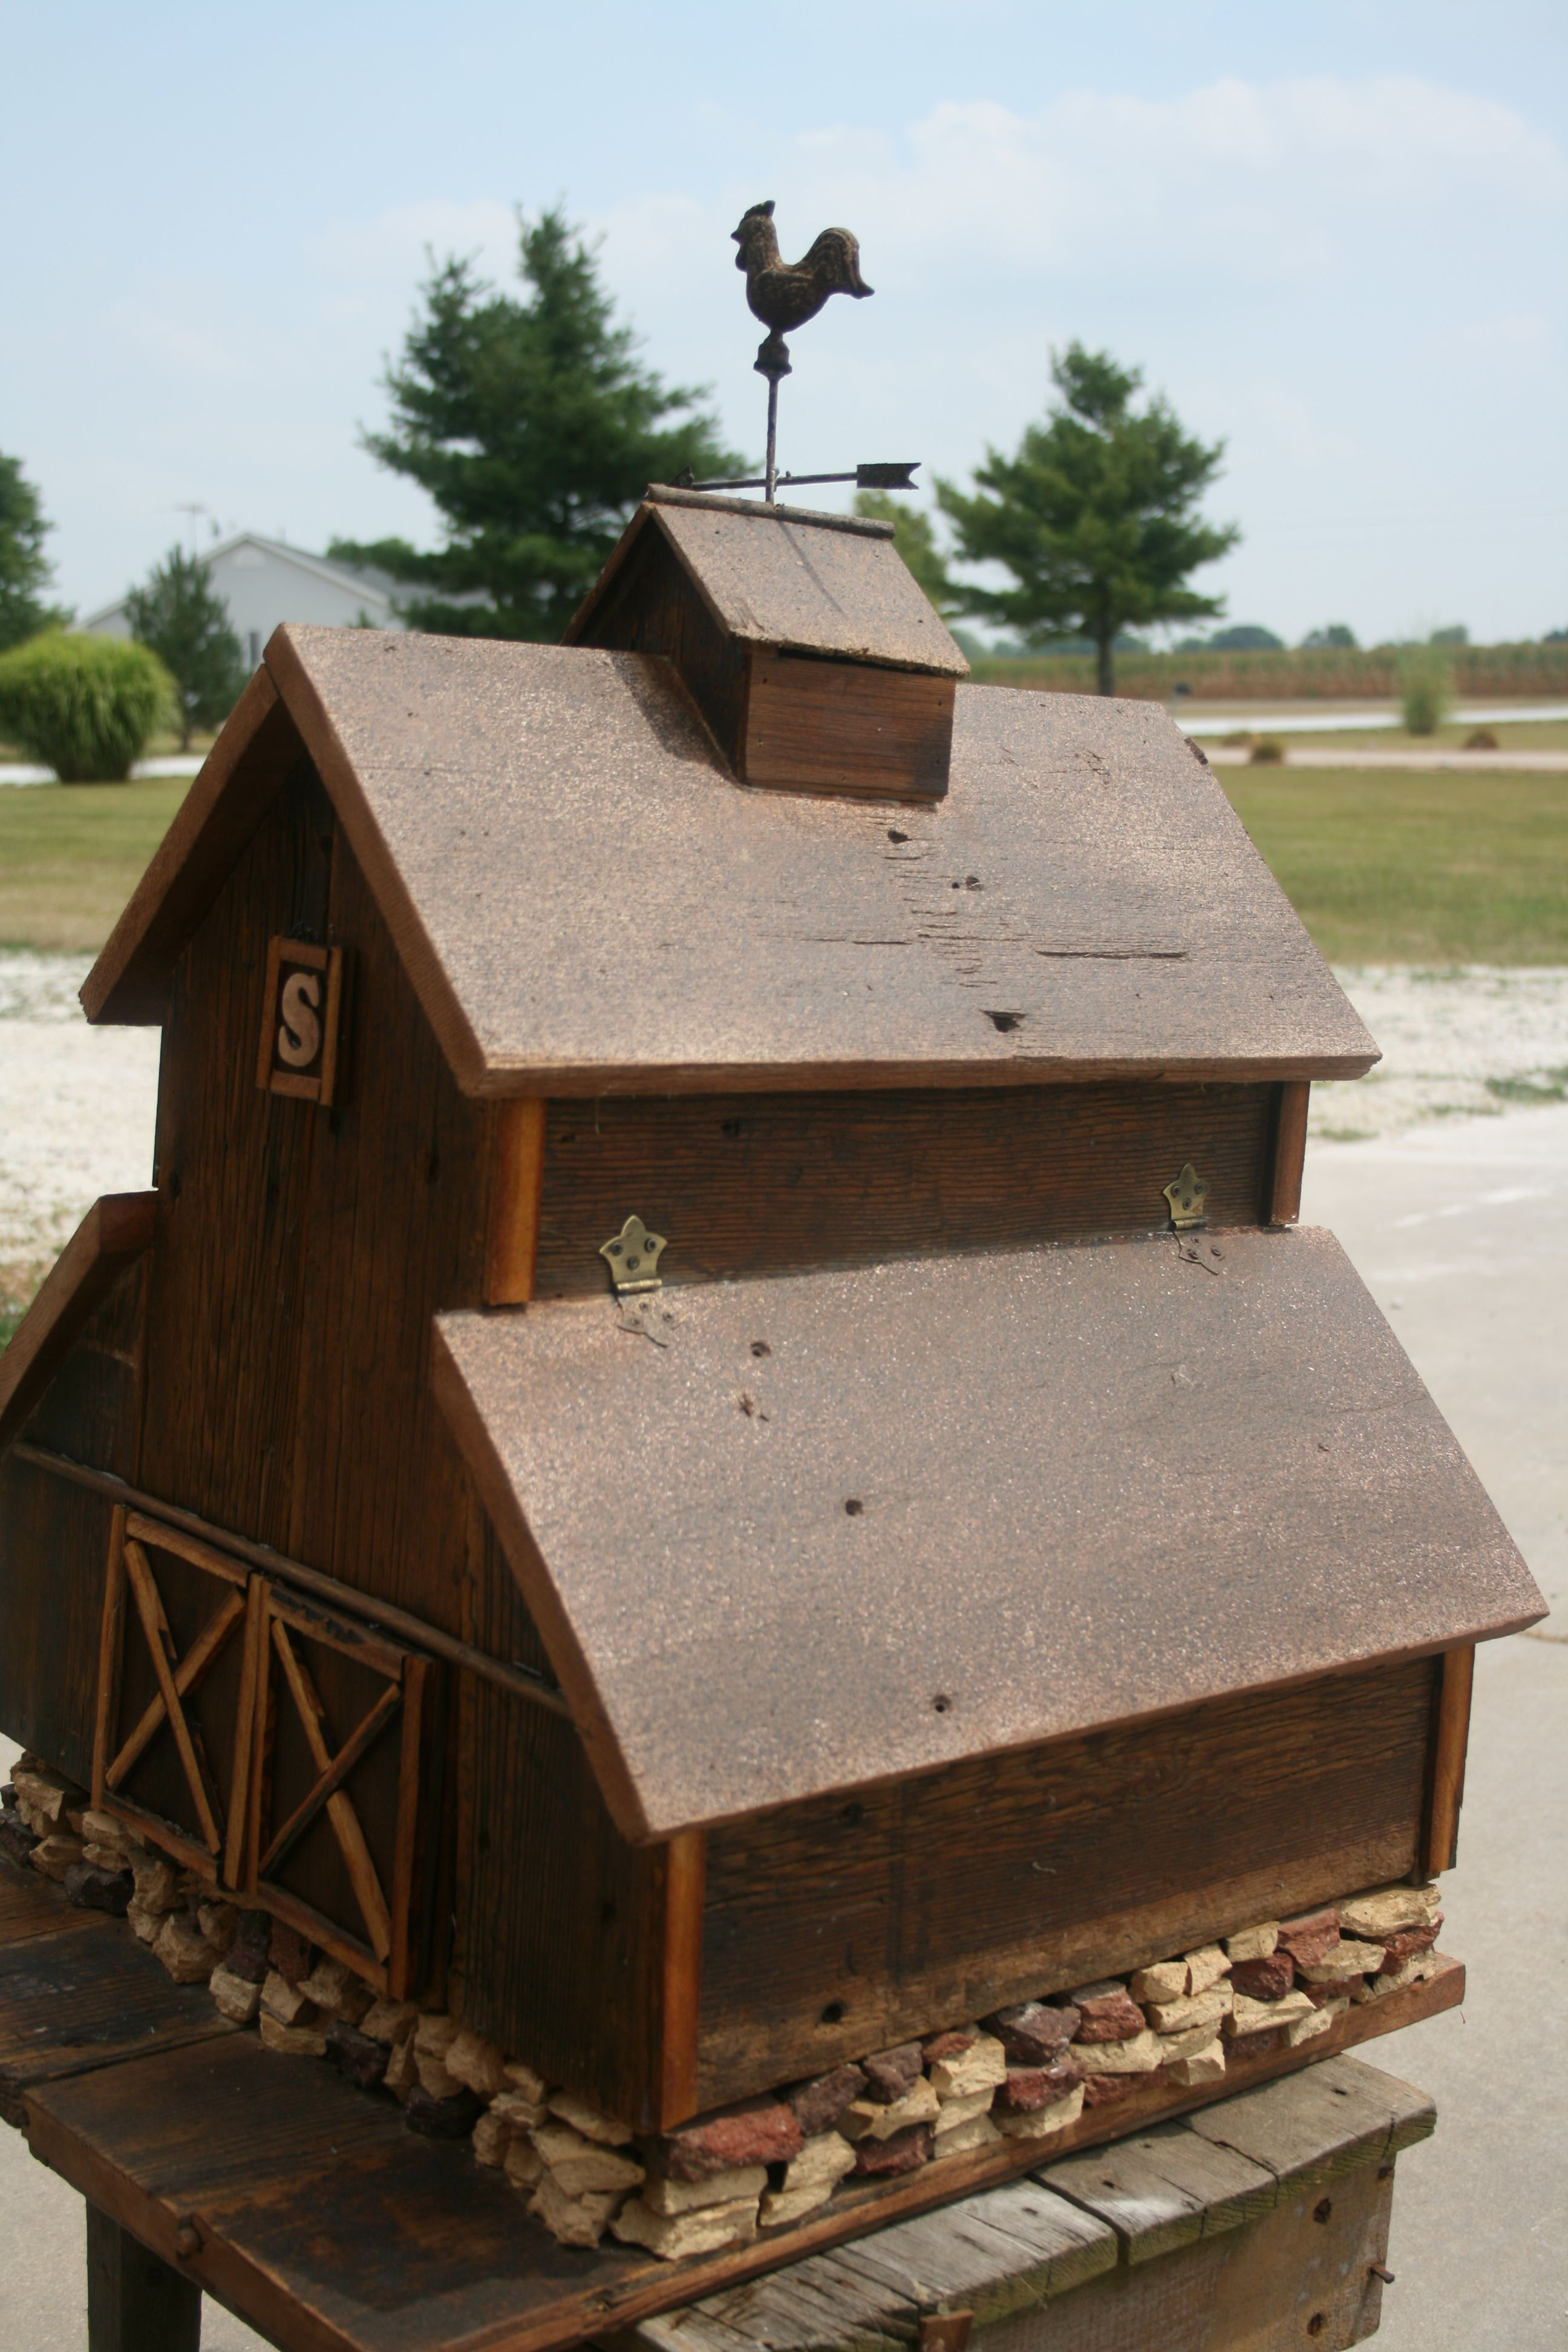 Barn birdhouse side view rustic birdhouses - Old barn wood bird houses ...